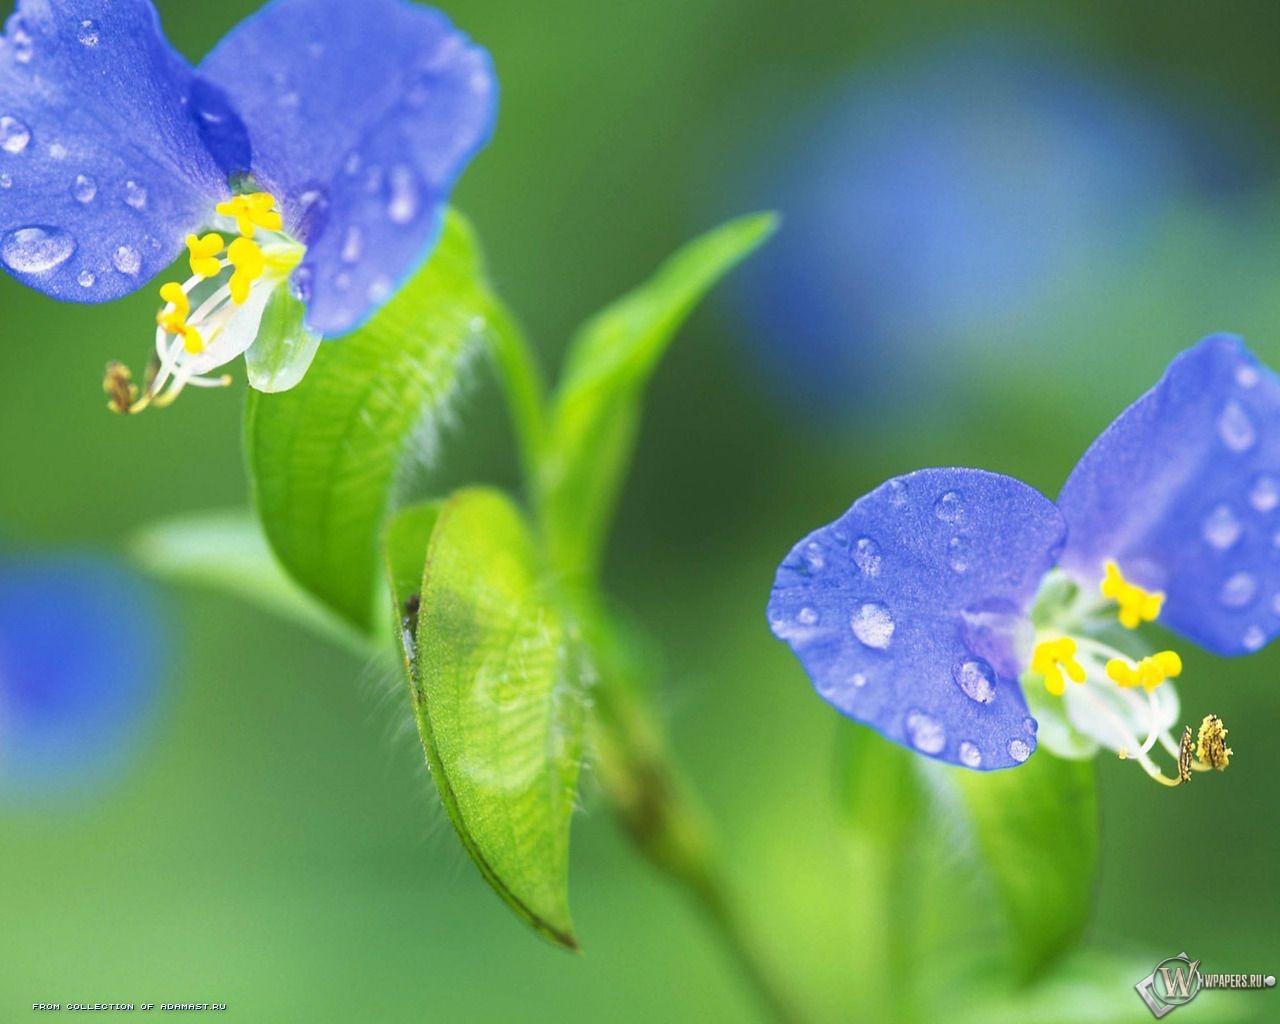 Цветик-семицветик 1280x1024